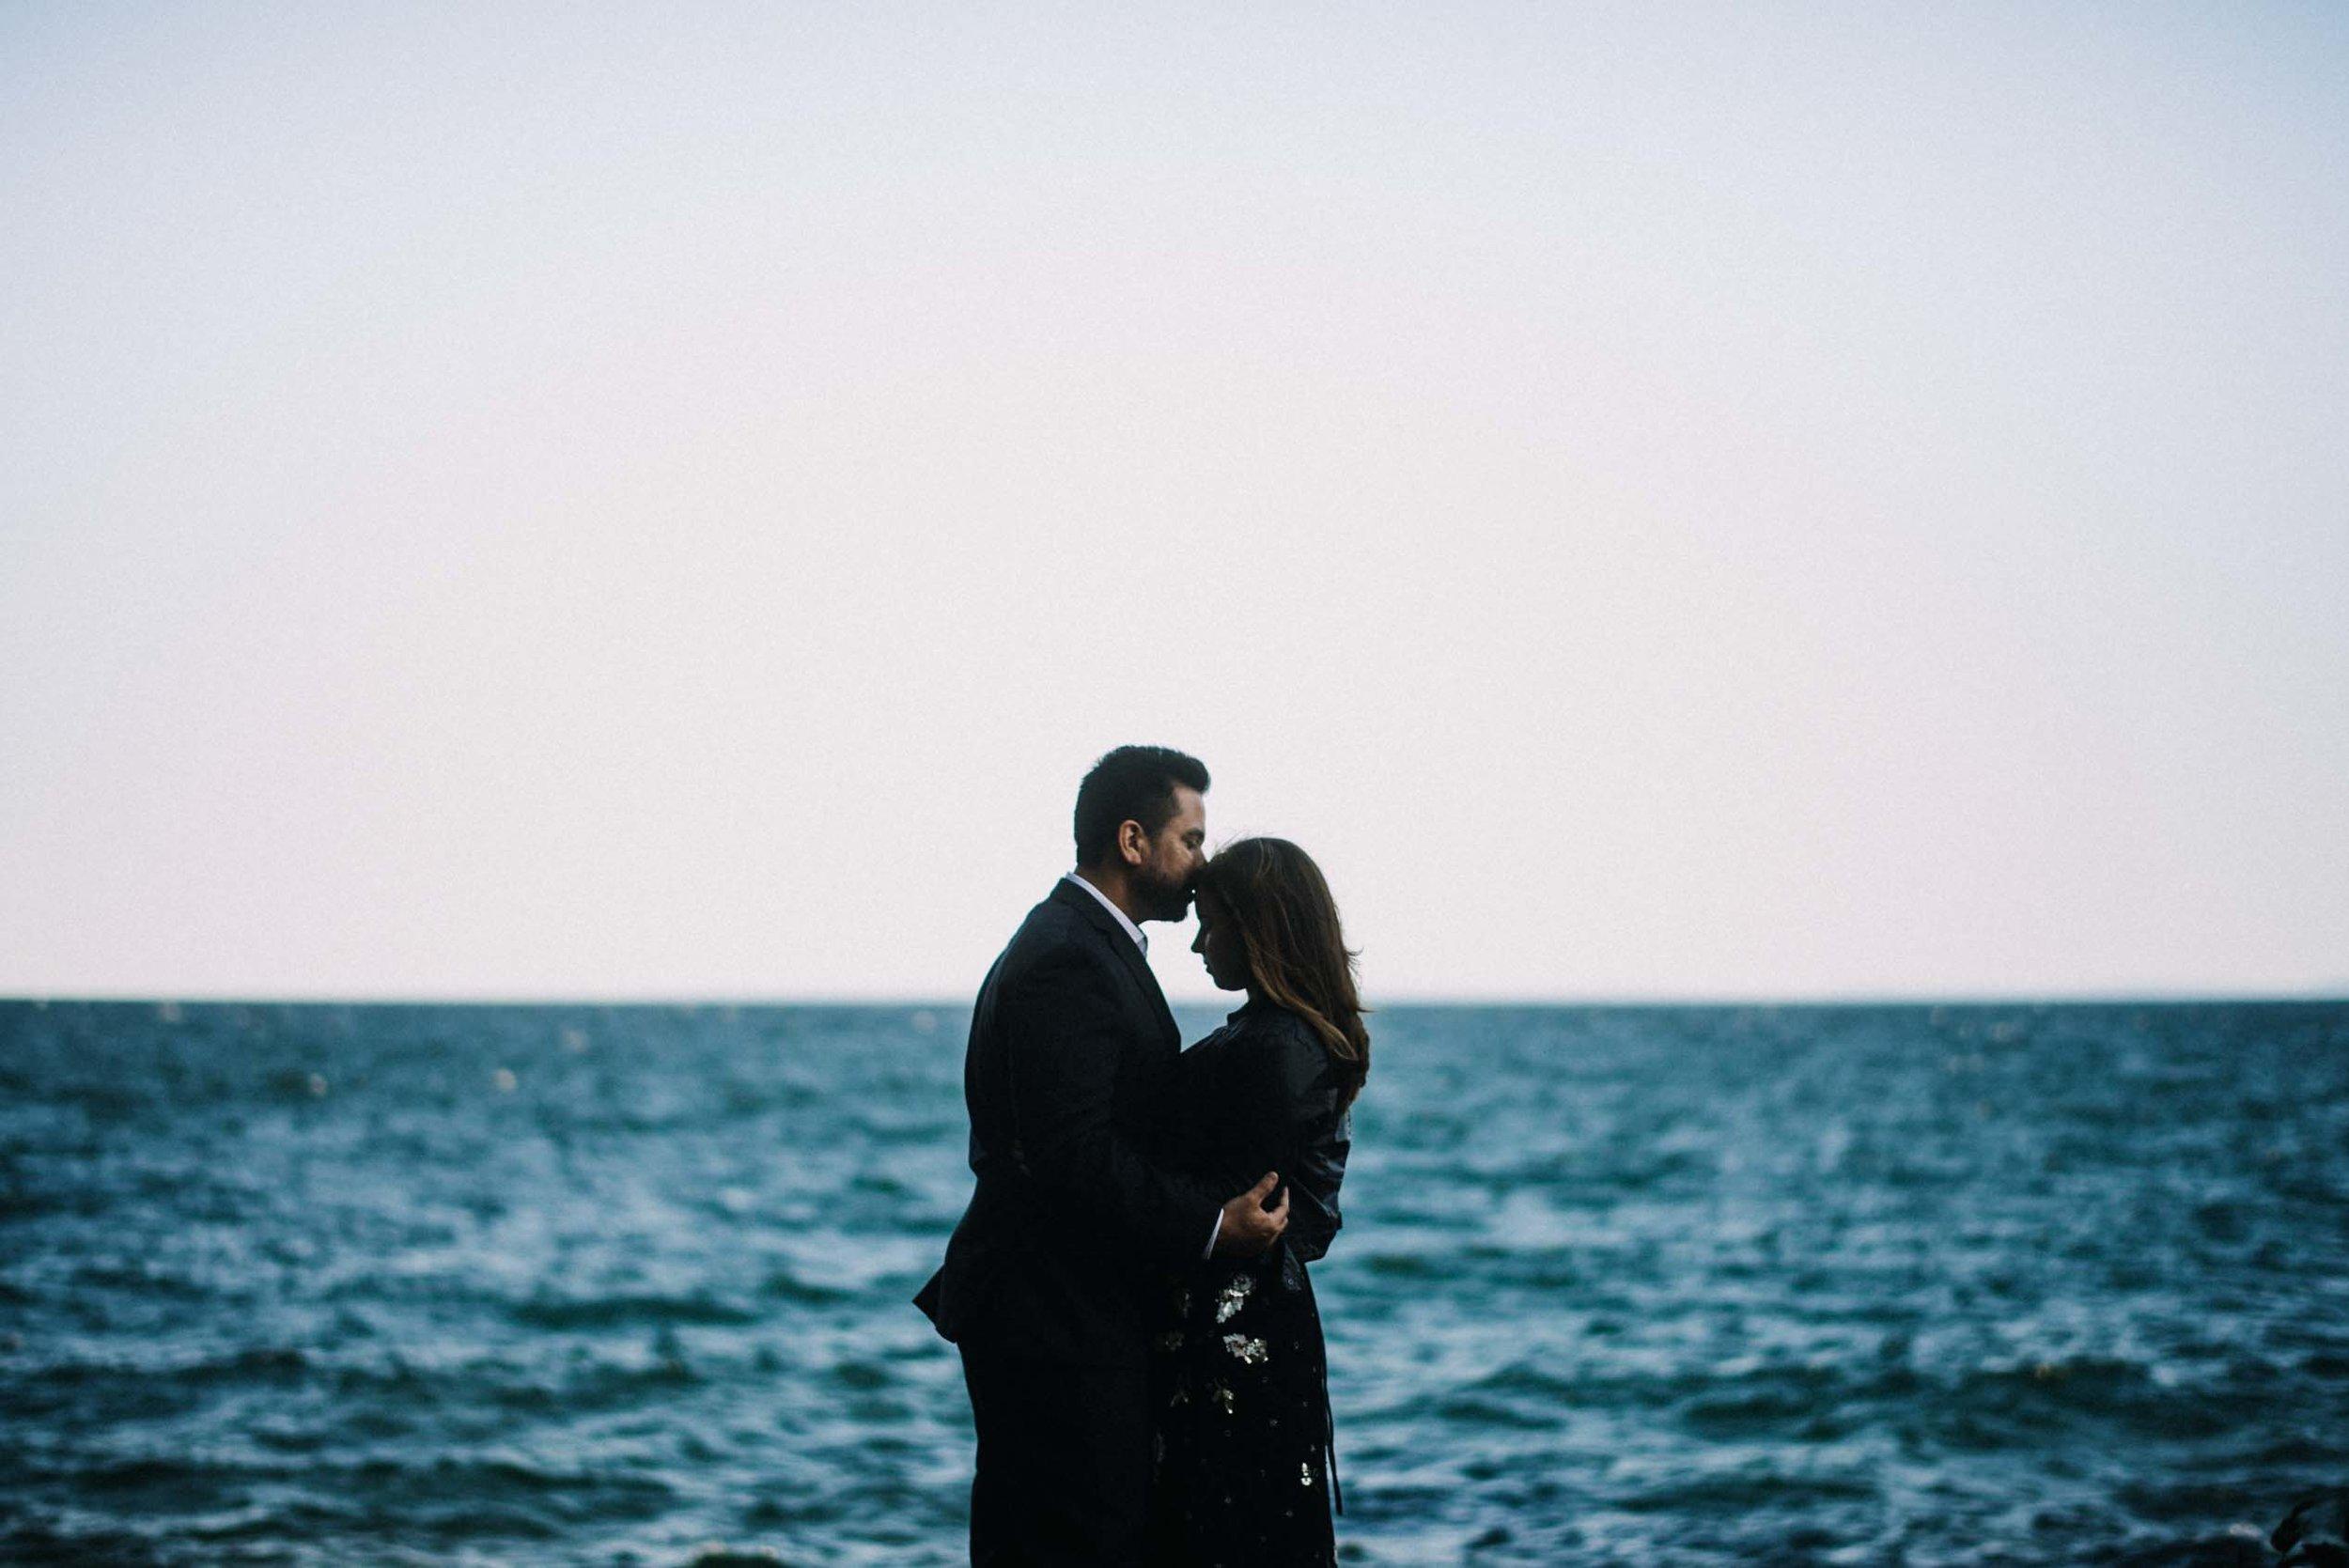 bayfield_madeline_island_wisconsin_wedding_engagement_session-5463.JPG